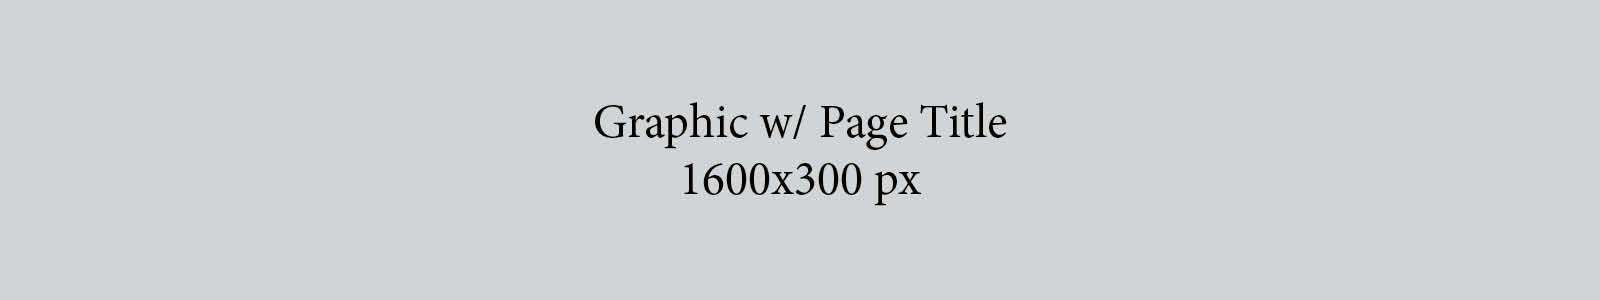 headerGraphic placeholder